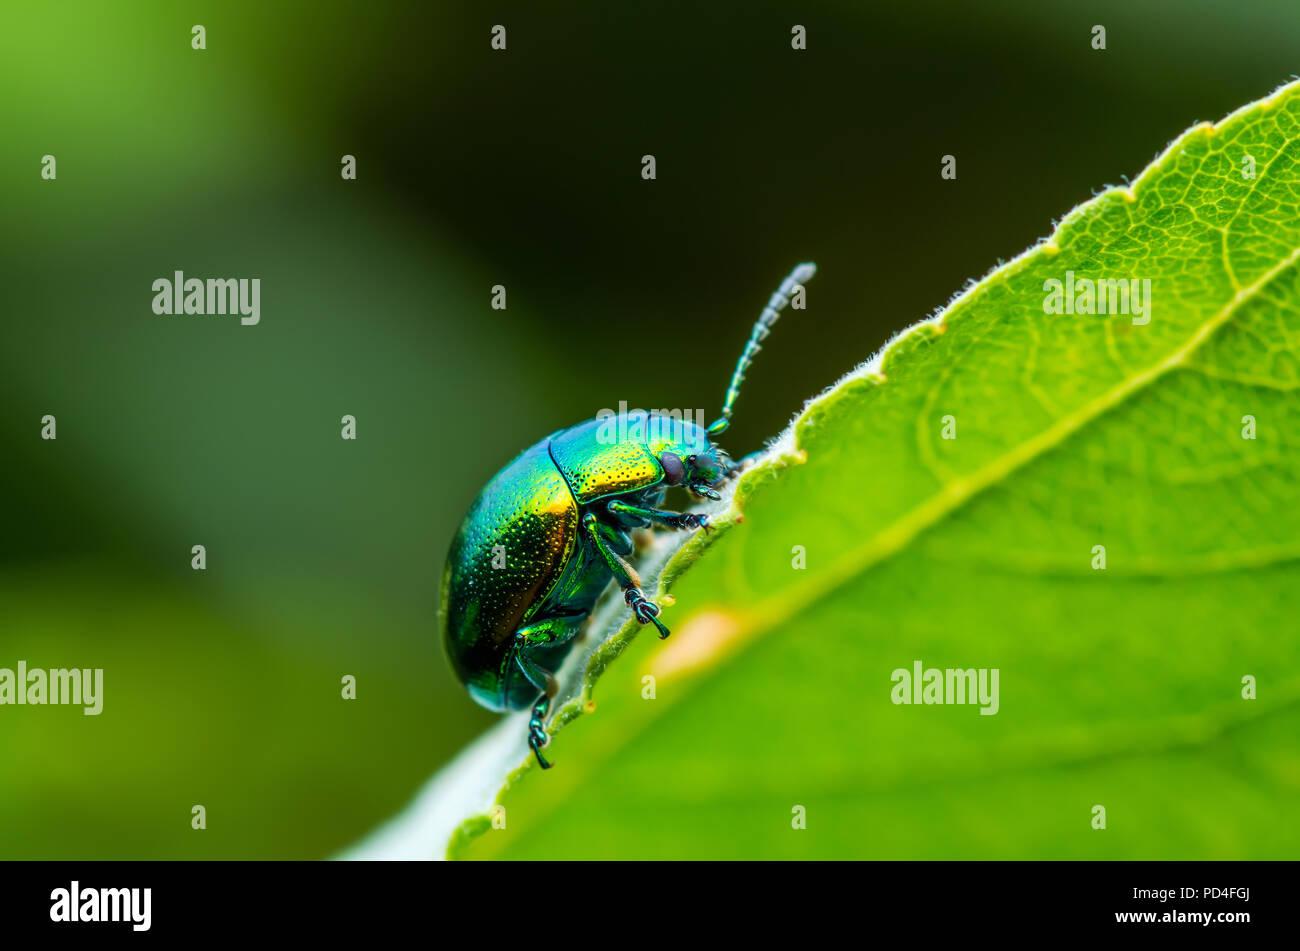 Chrysolina Coerulans Blue Mint Leaf Beetle Insect Crawling on Green Leaf Macro - Stock Image